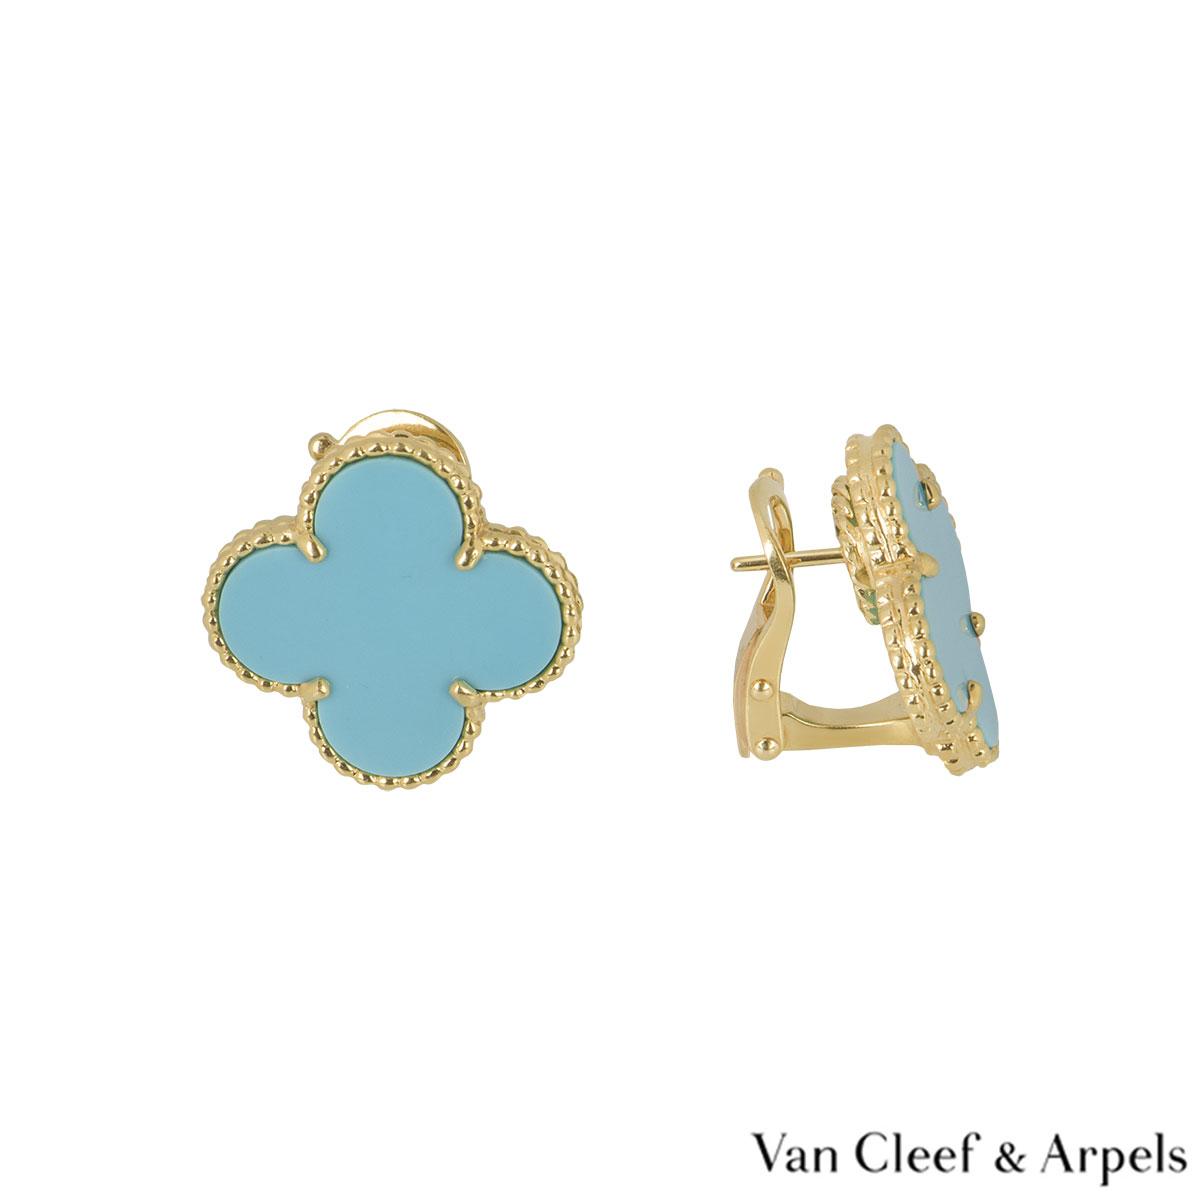 Van Cleef & Arpels Yellow Gold Magic Alhambra Earrings